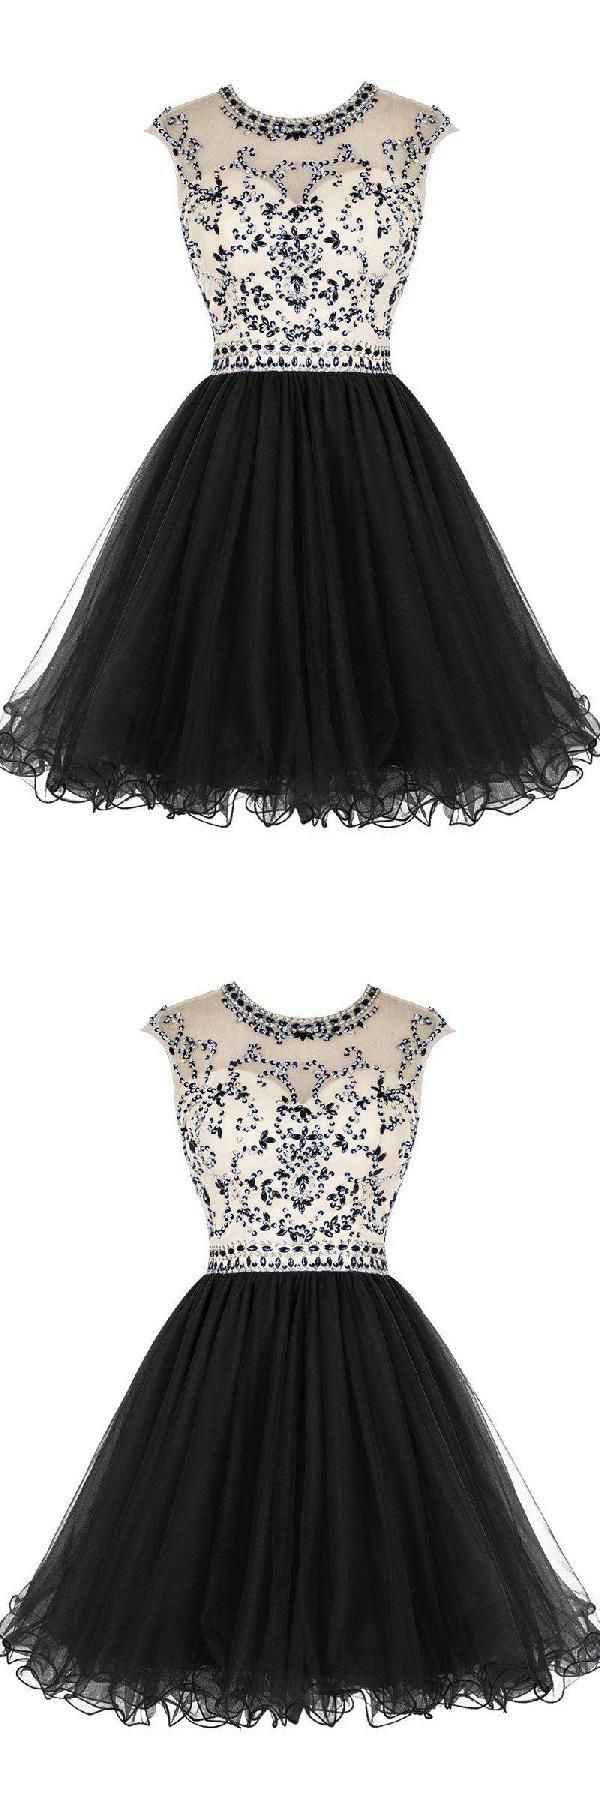 Prom dresses black sequin prom dresses short prom dresses